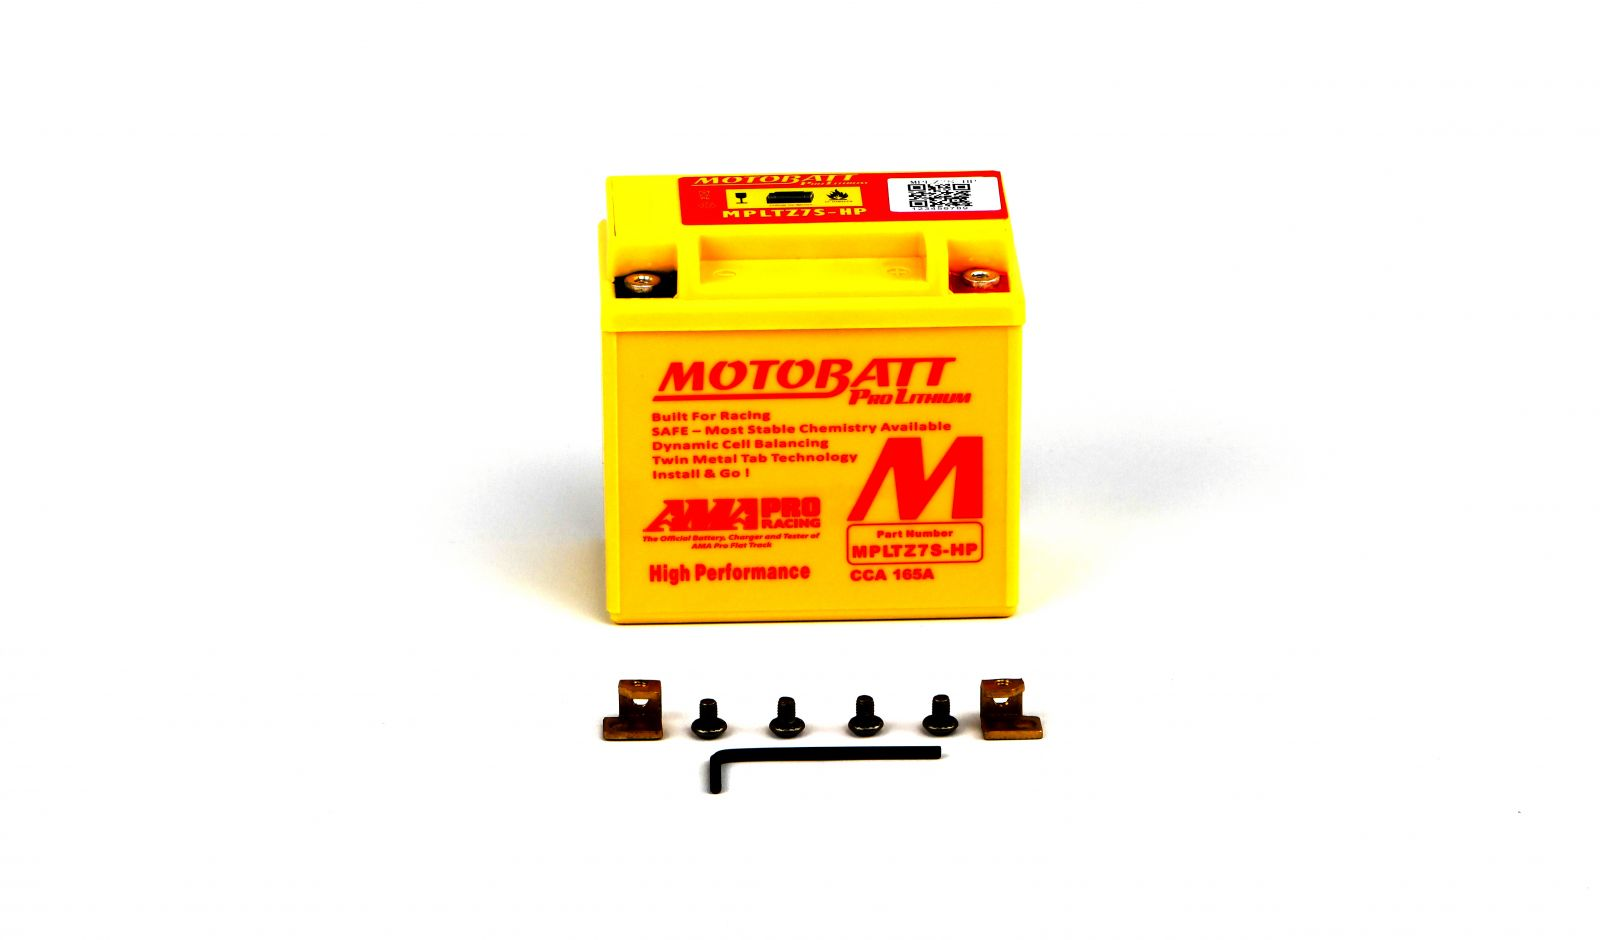 Motobatt Lithium Batteries - 501079MR image